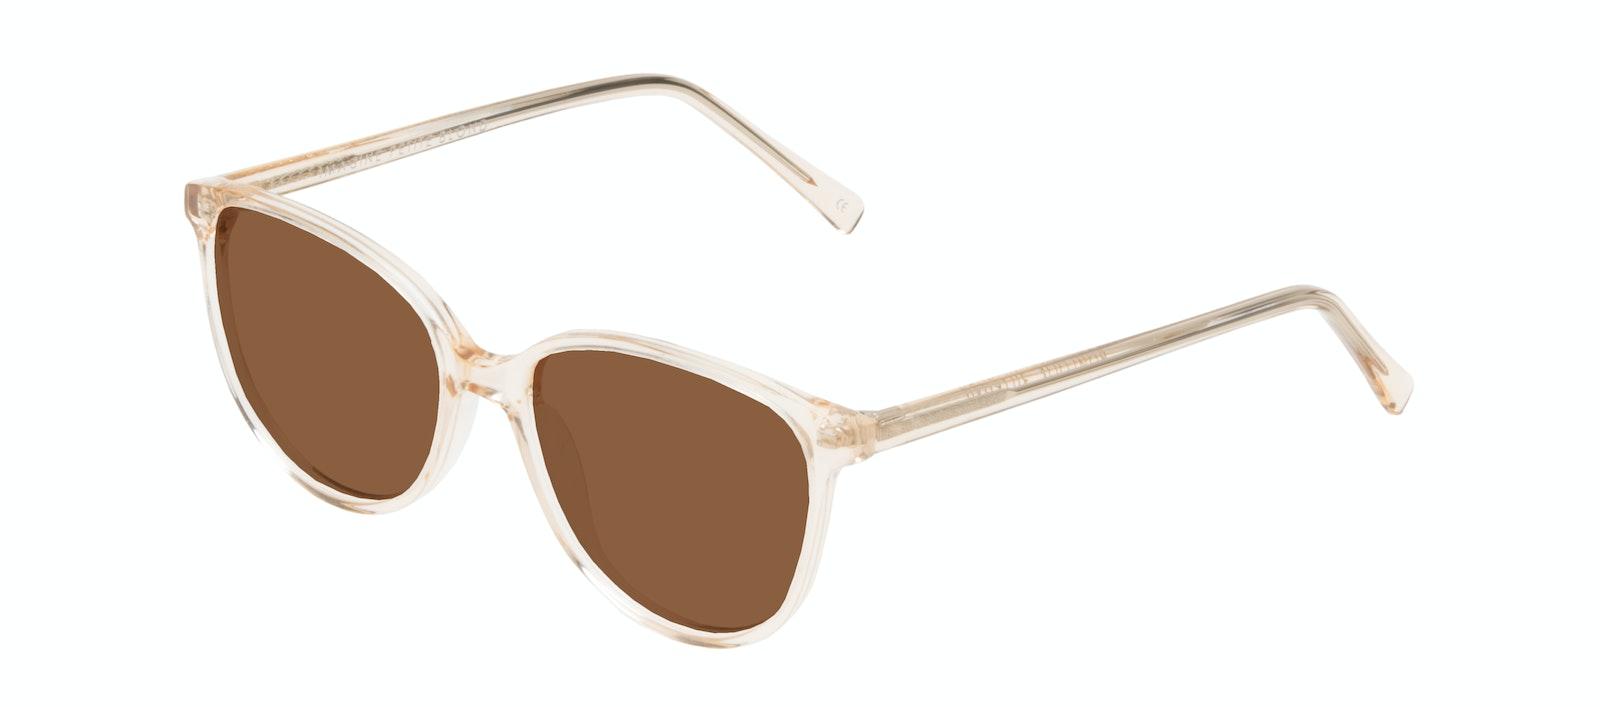 Affordable Fashion Glasses Round Sunglasses Women Imagine Petite Blond Tilt